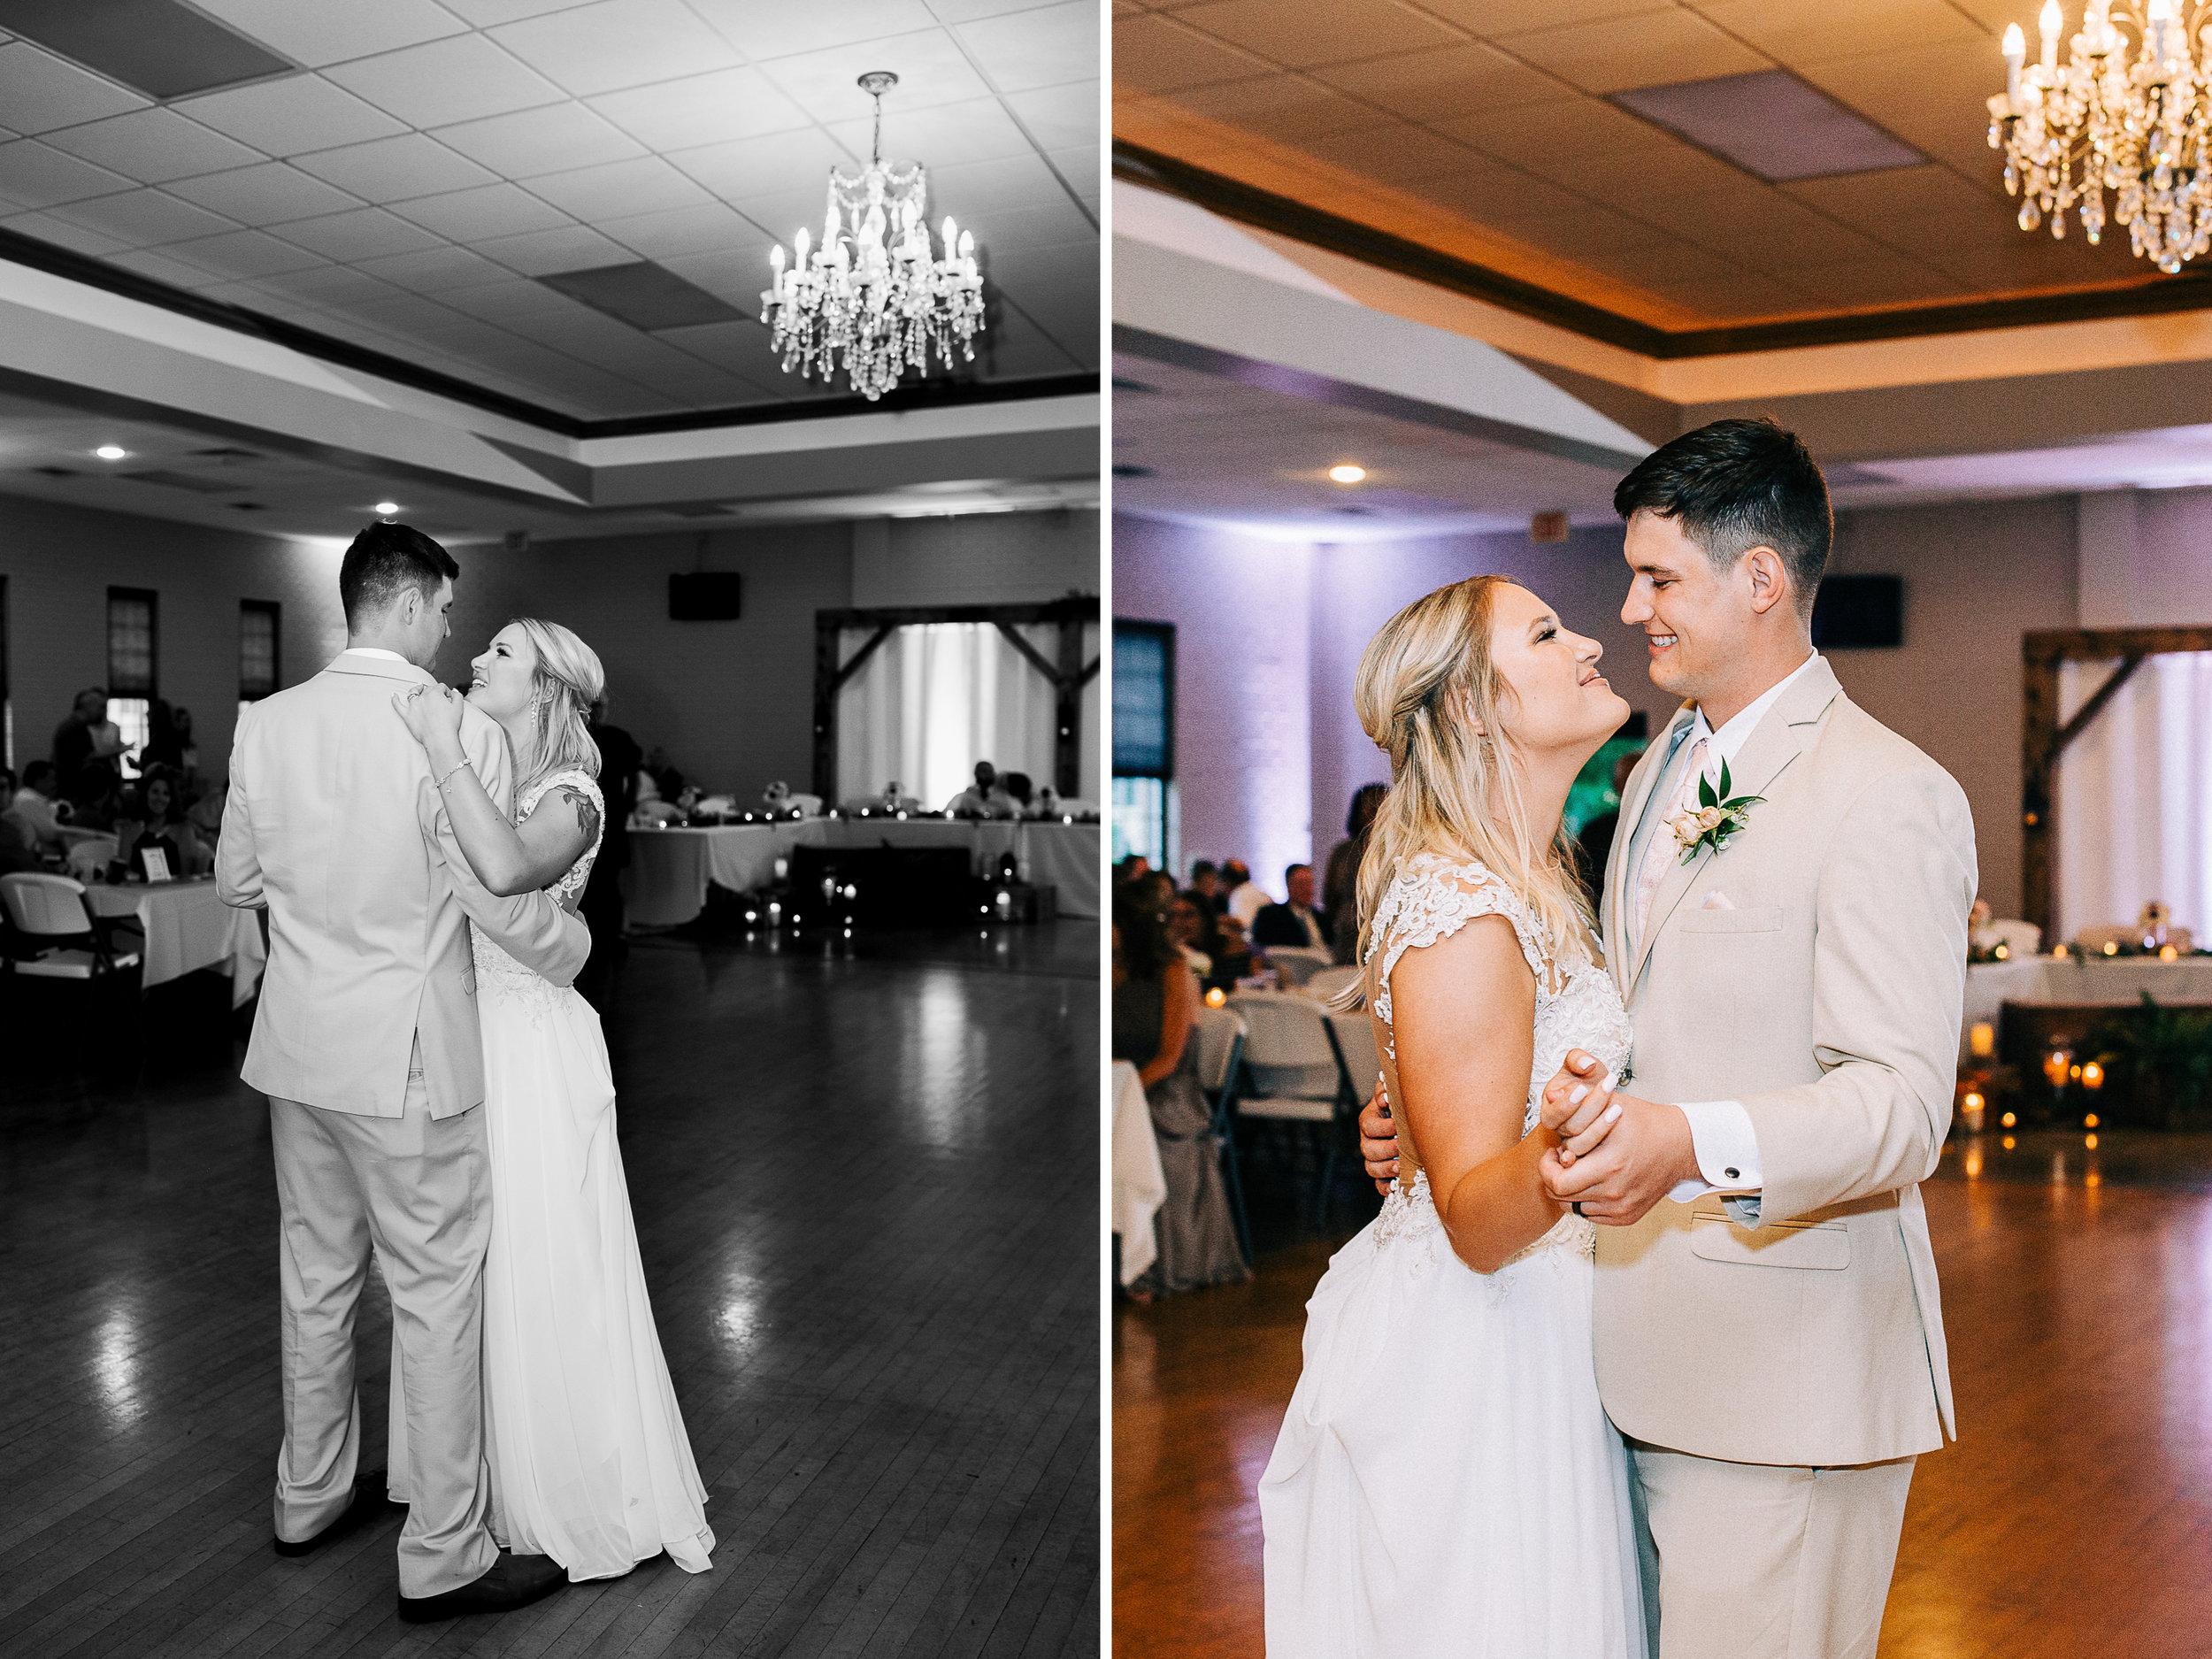 Dorothy_Louise_Photography_Marissa_Jake_Wentzville_MO_Wedding21.jpg